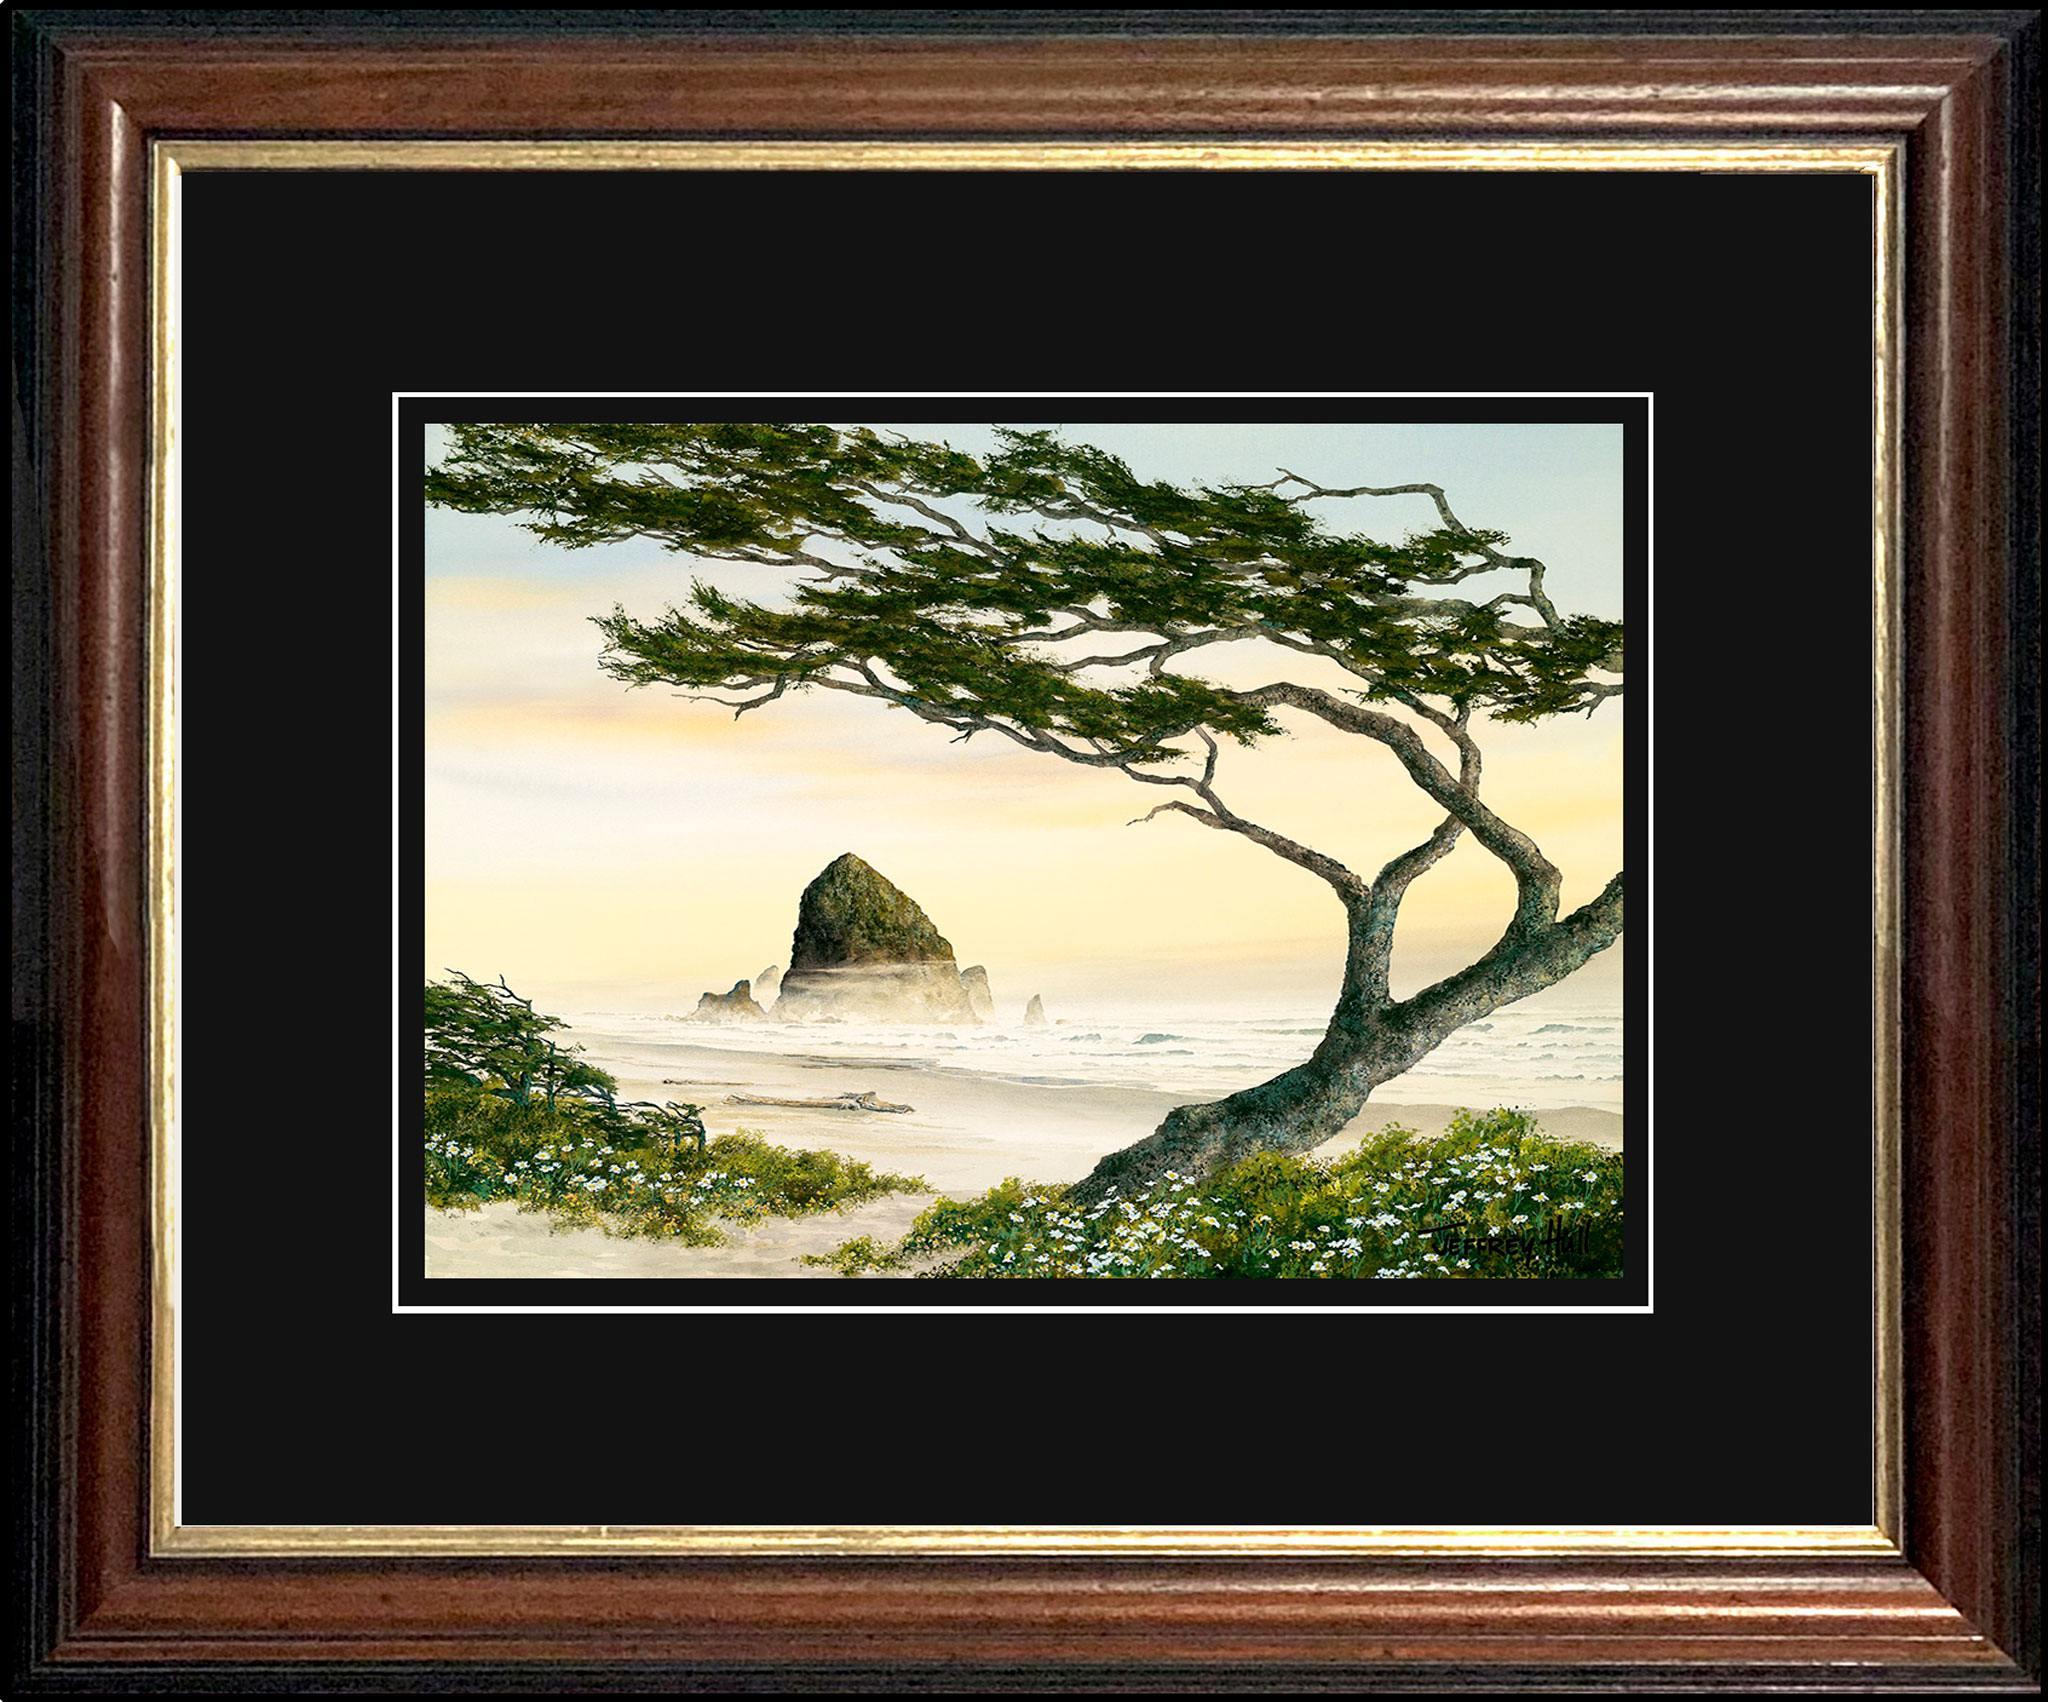 The-Wedding-Tree-OpenEd-Malabar-Jet-Black-4-Website-2021